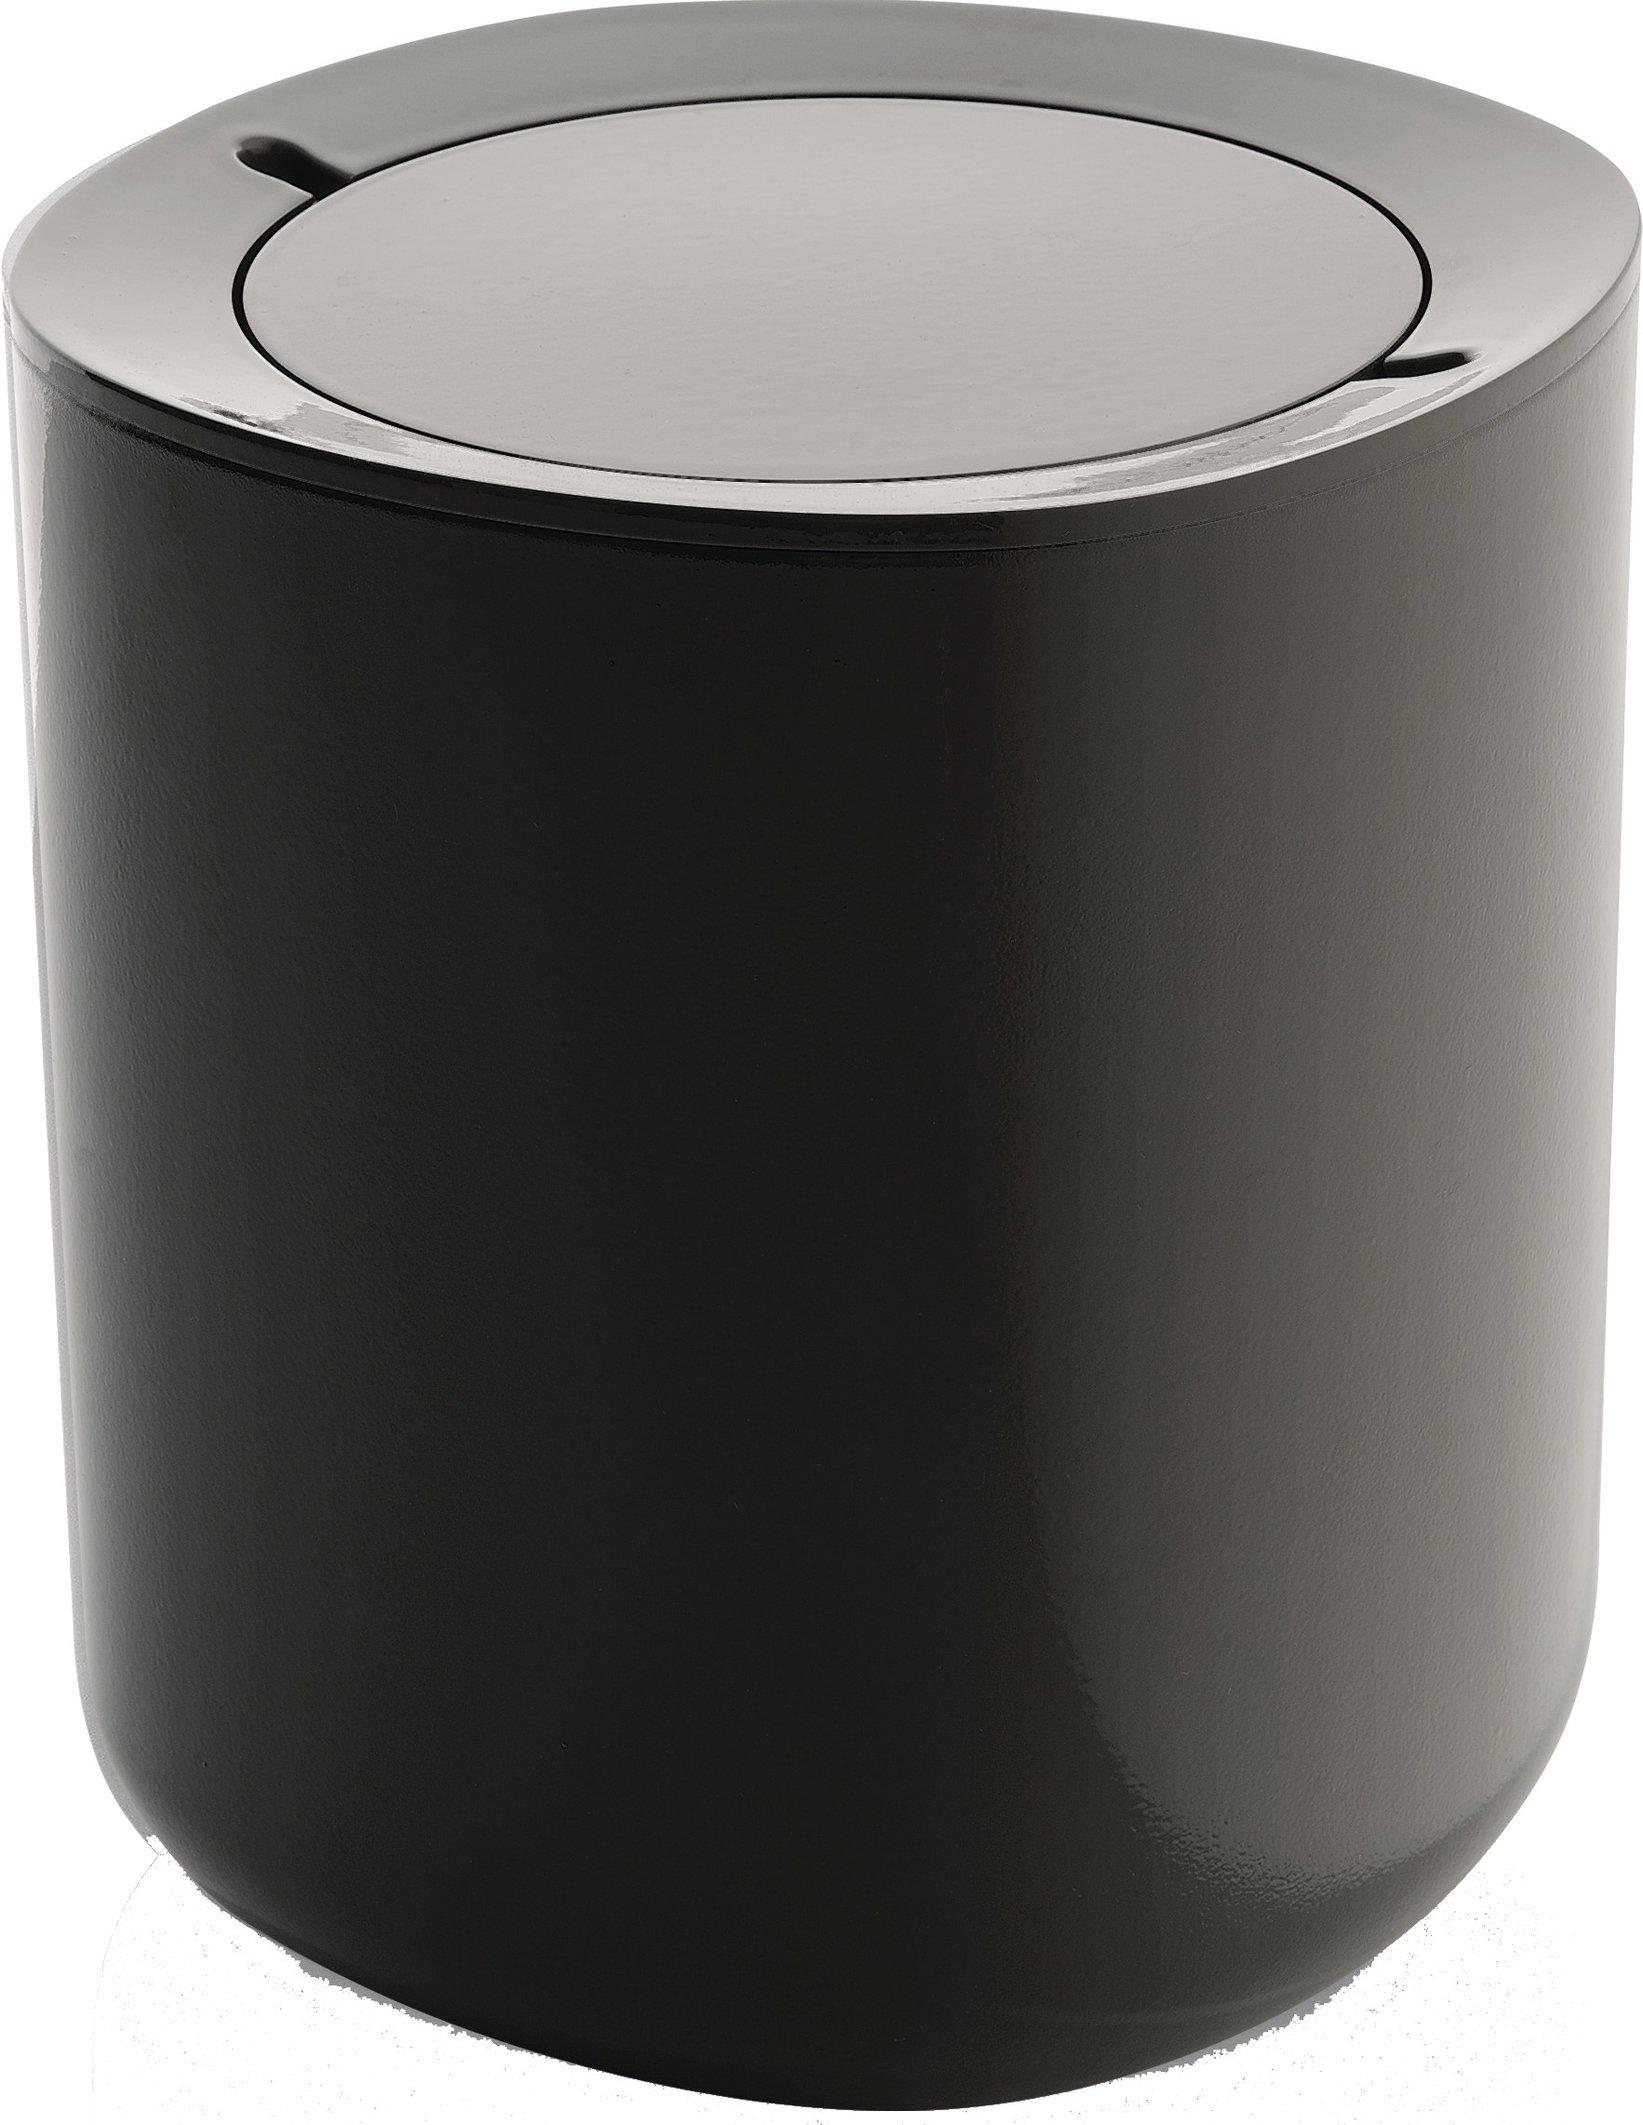 Alessi ''Birillo'' Bathroom Waste Bin, Dark Grey